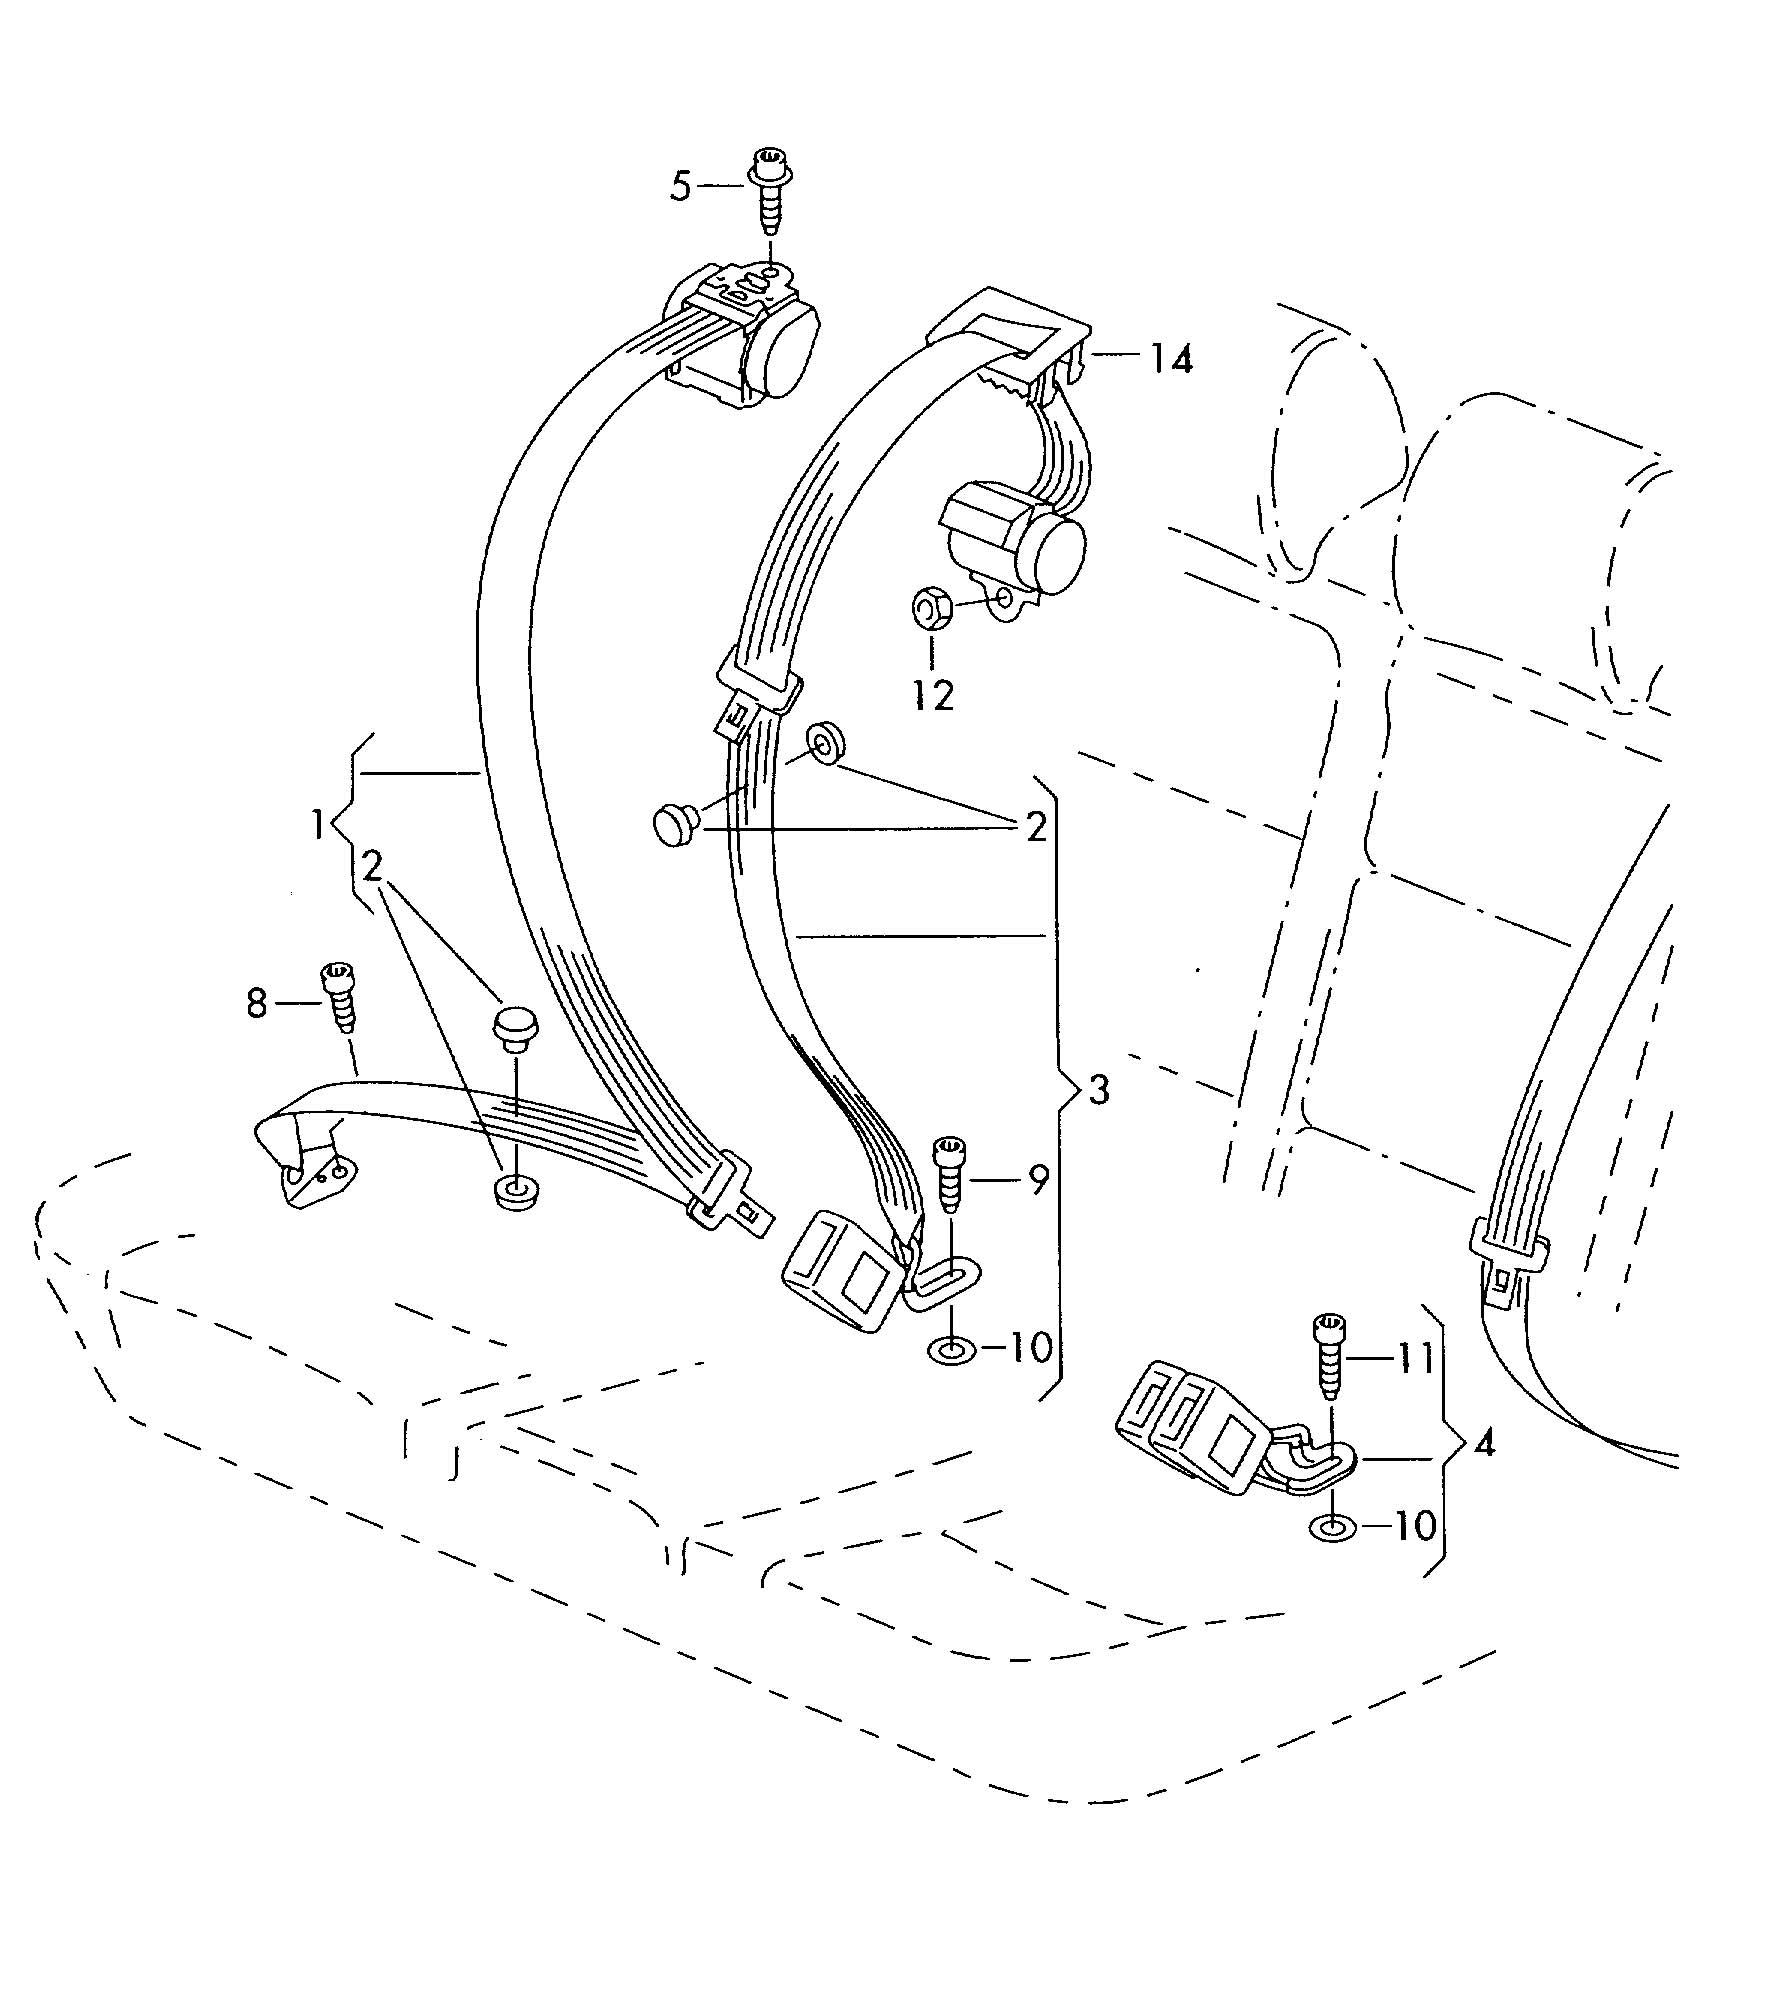 2008 Hyundai Tiburon Fuse Box Diagram. Hyundai. Auto Fuse